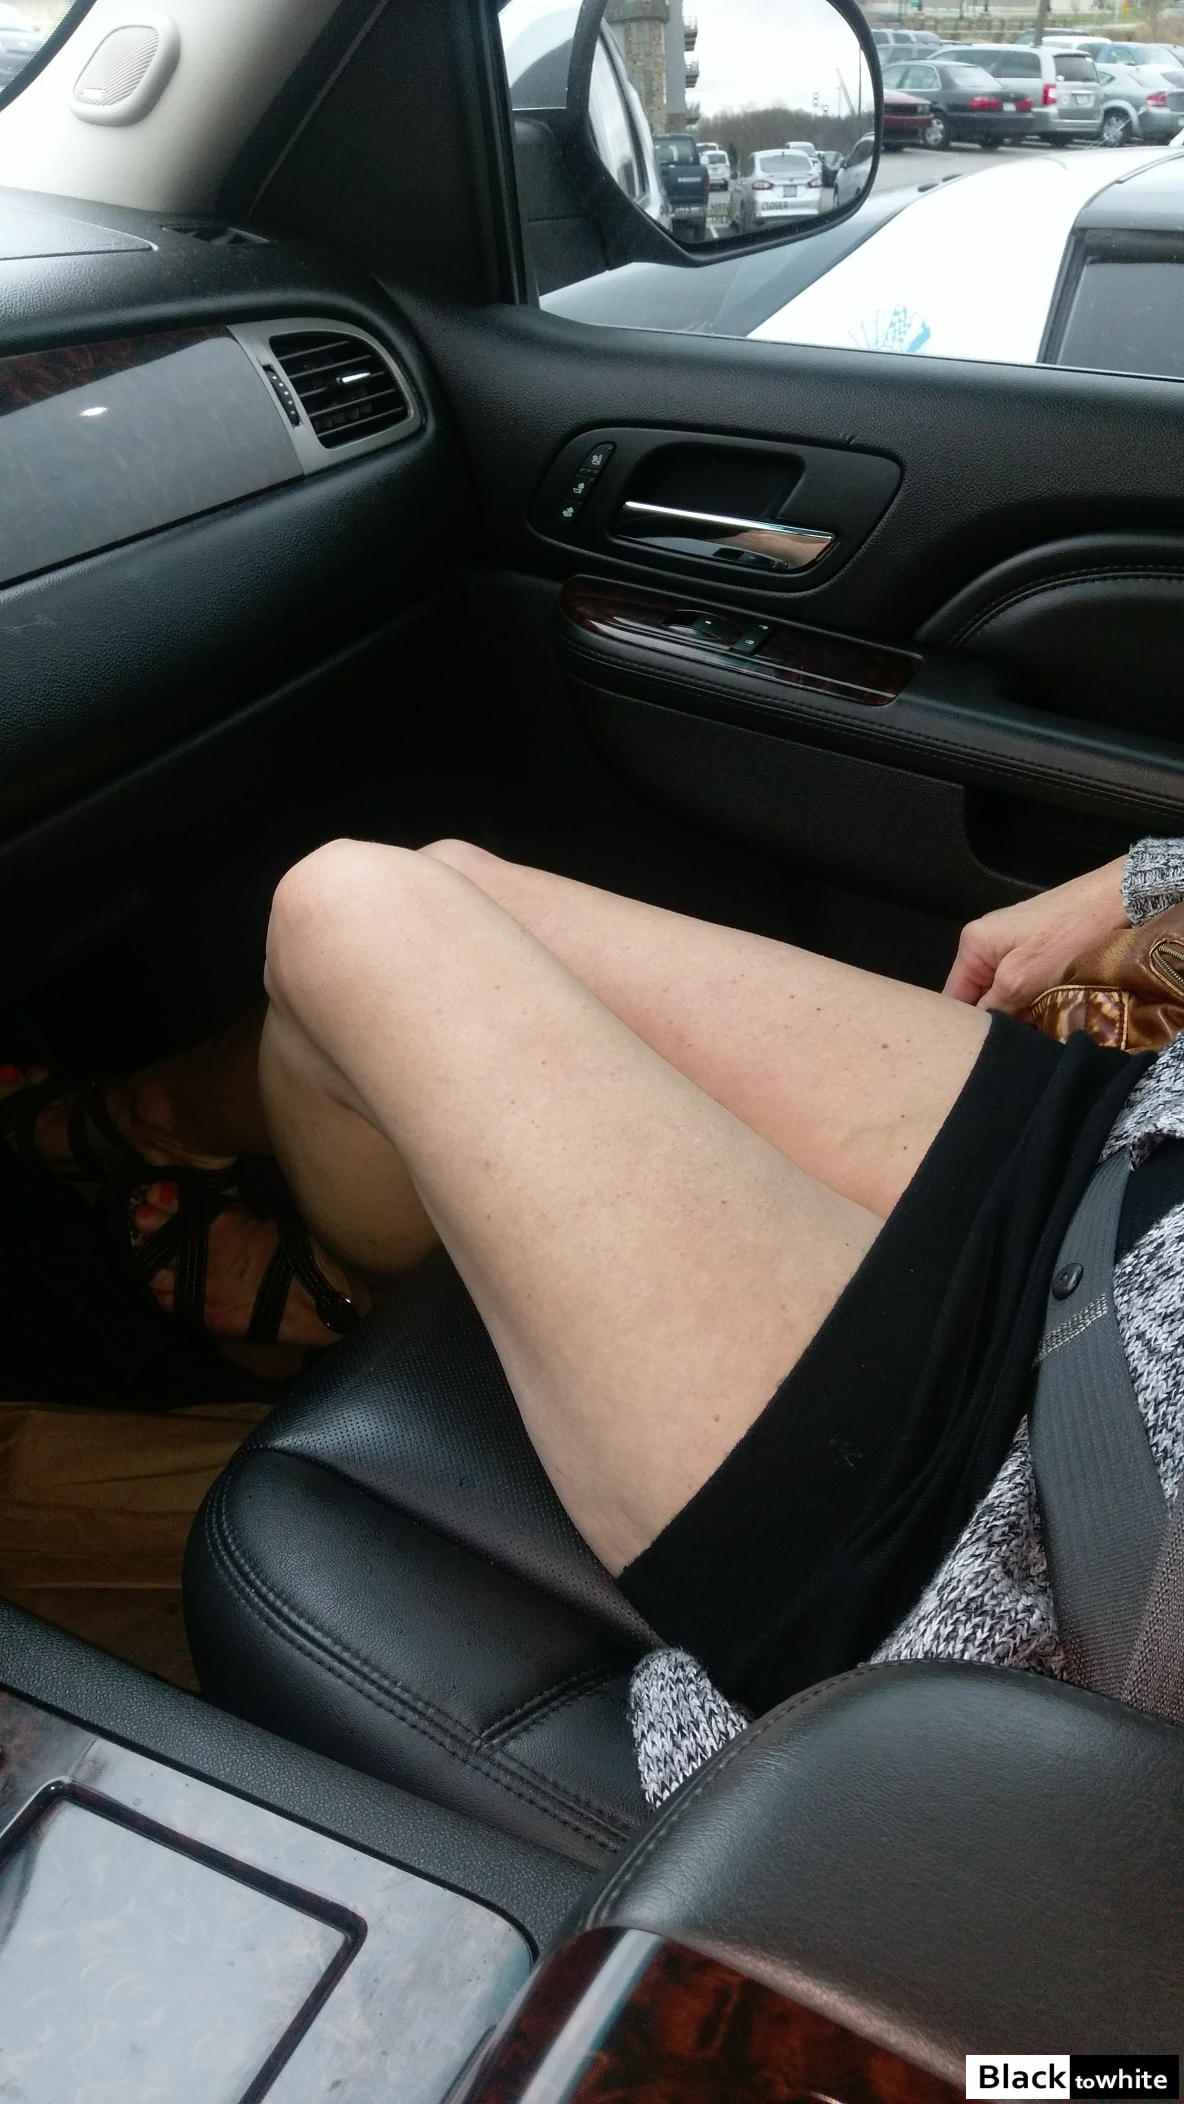 date night   amateur interracial community - cuckold sex forum